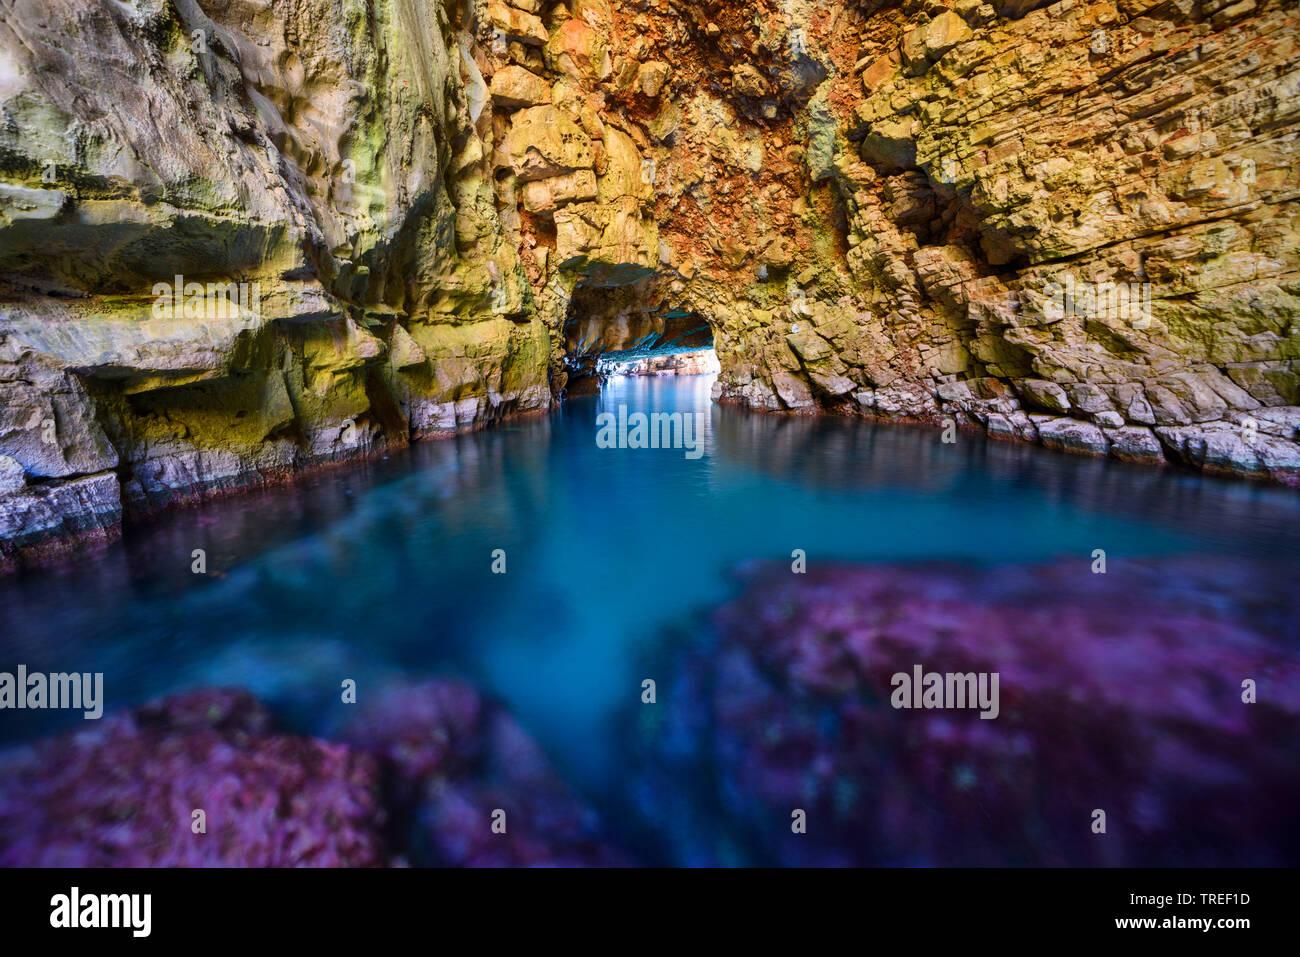 Odysseus-Hoehle an der Kueste von Mljet, Kroatien, Mljet Nationalpark | Odysseus Cave on the coast of Mljet, Croatia, Mljet National Park | BLWS524867 - Stock Image